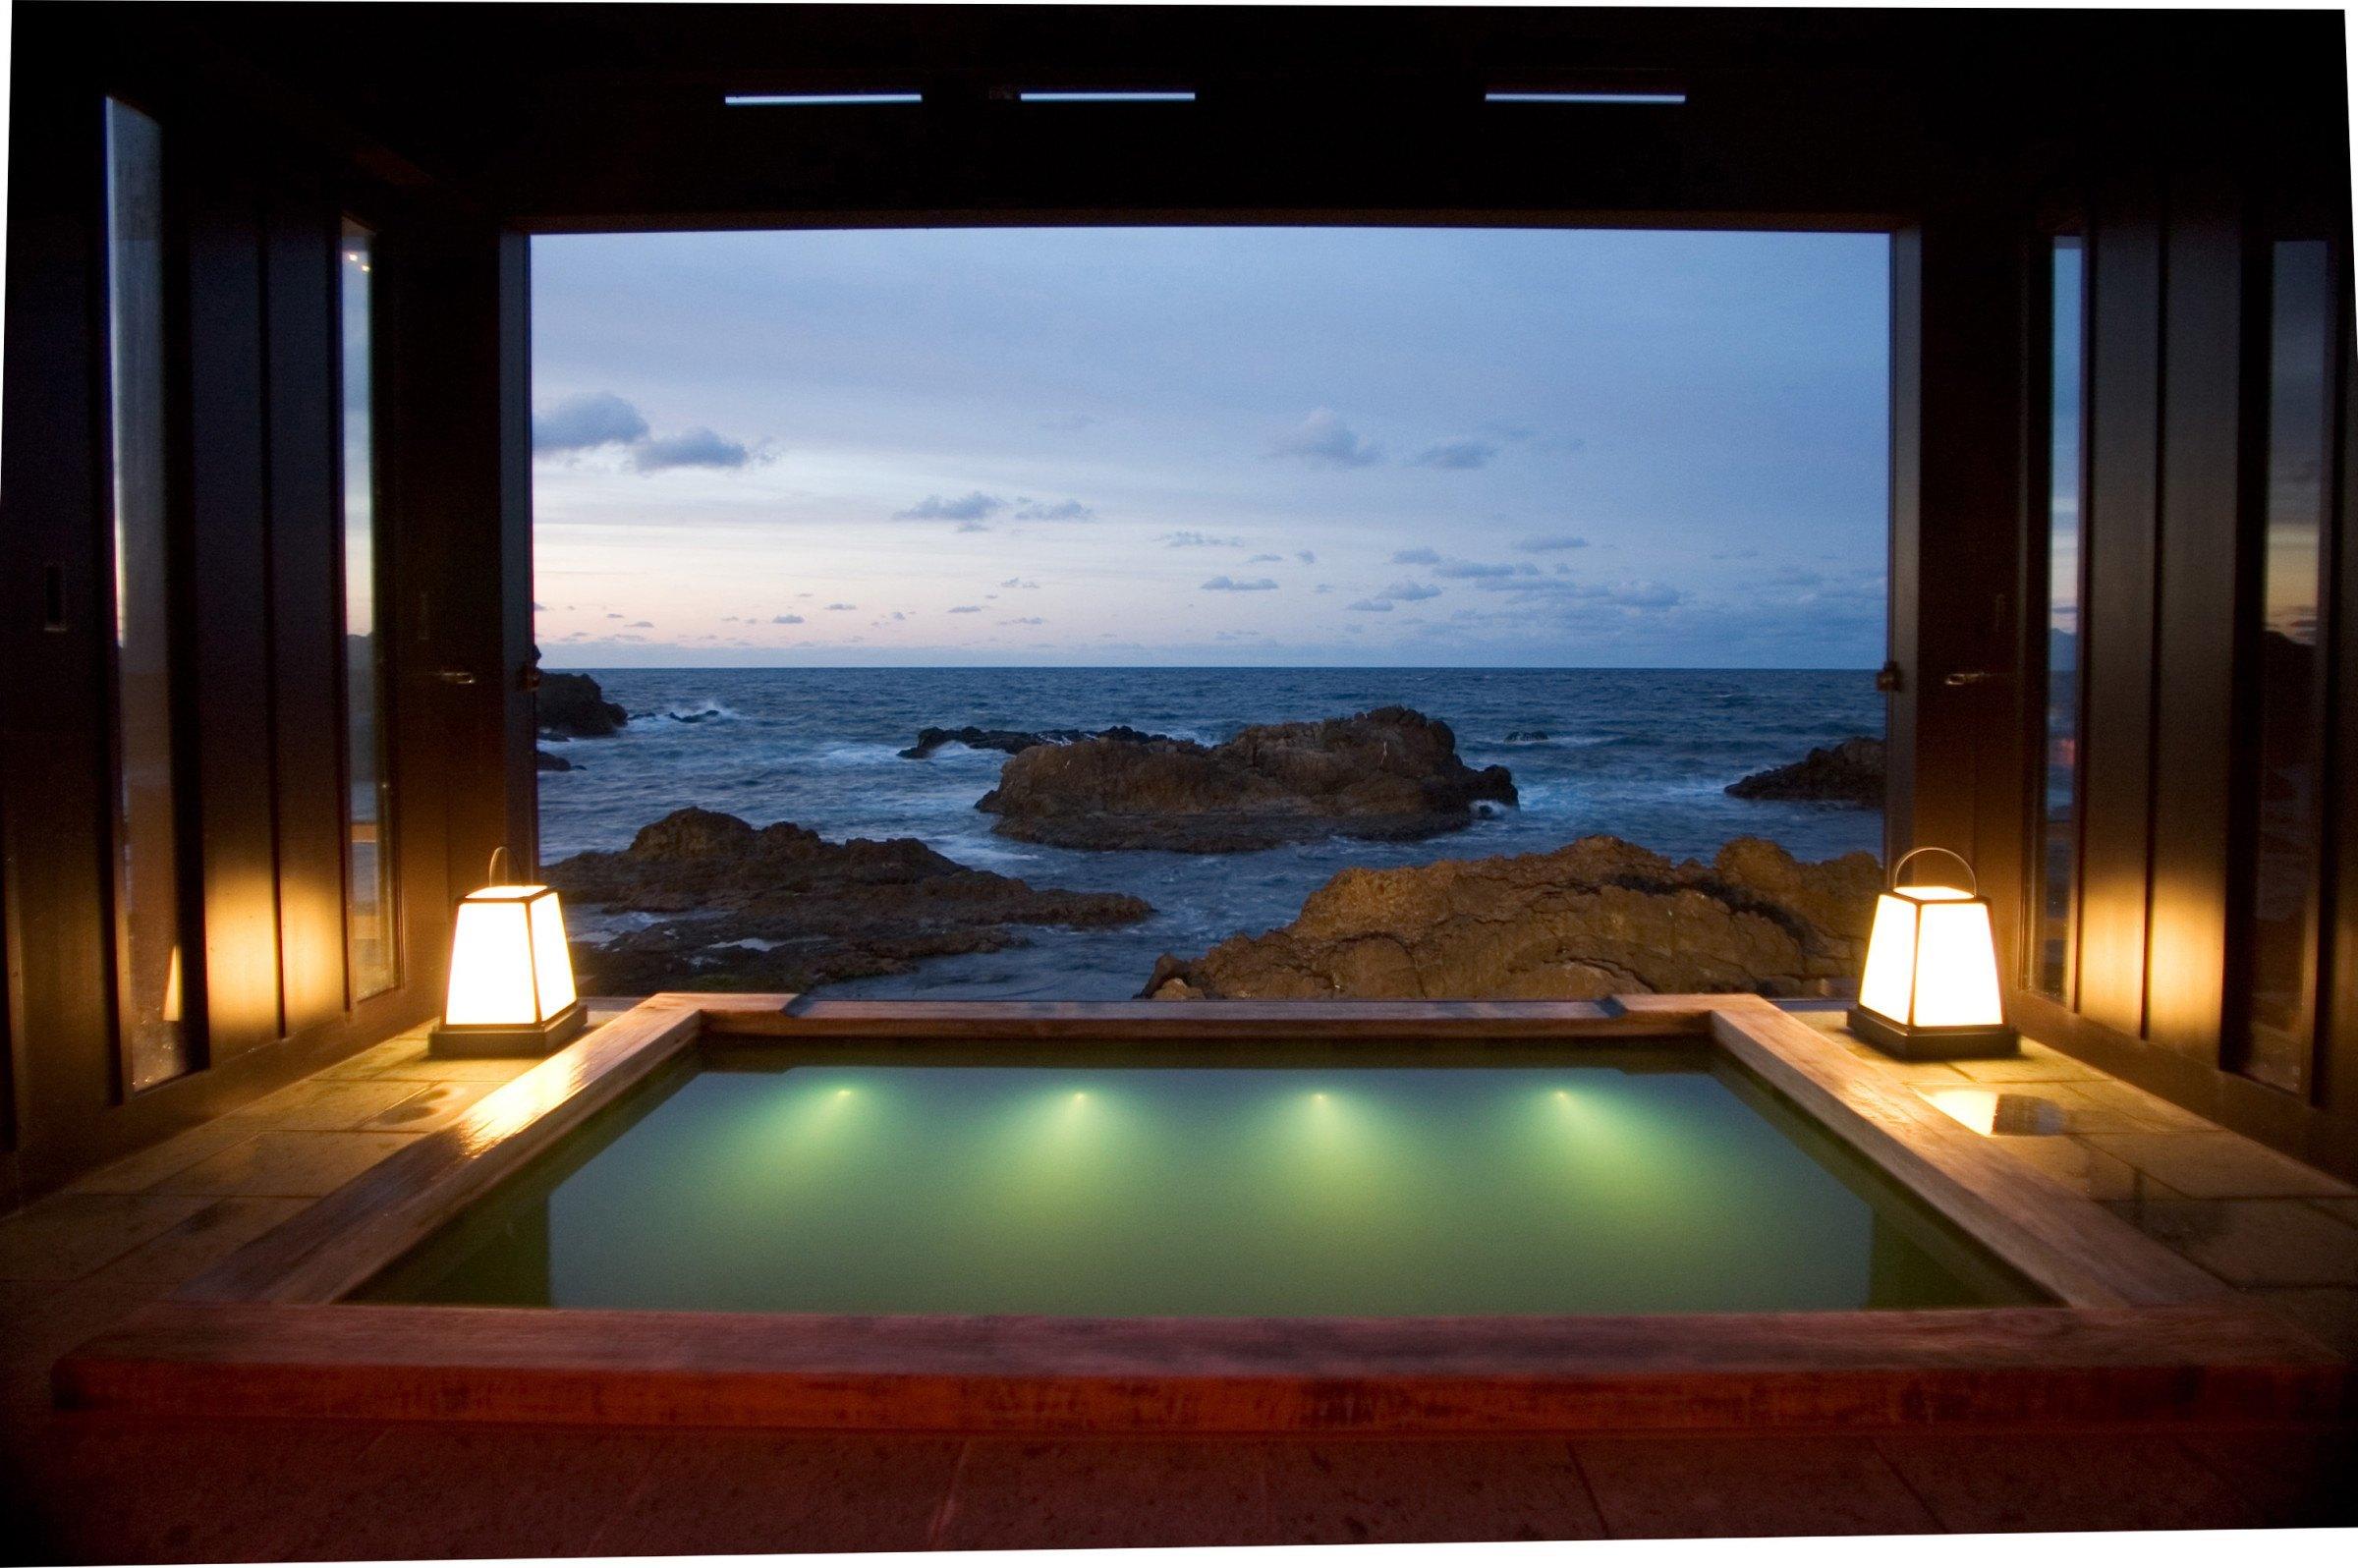 A hot spring bath overlooking the ocean at Lamp no Yado